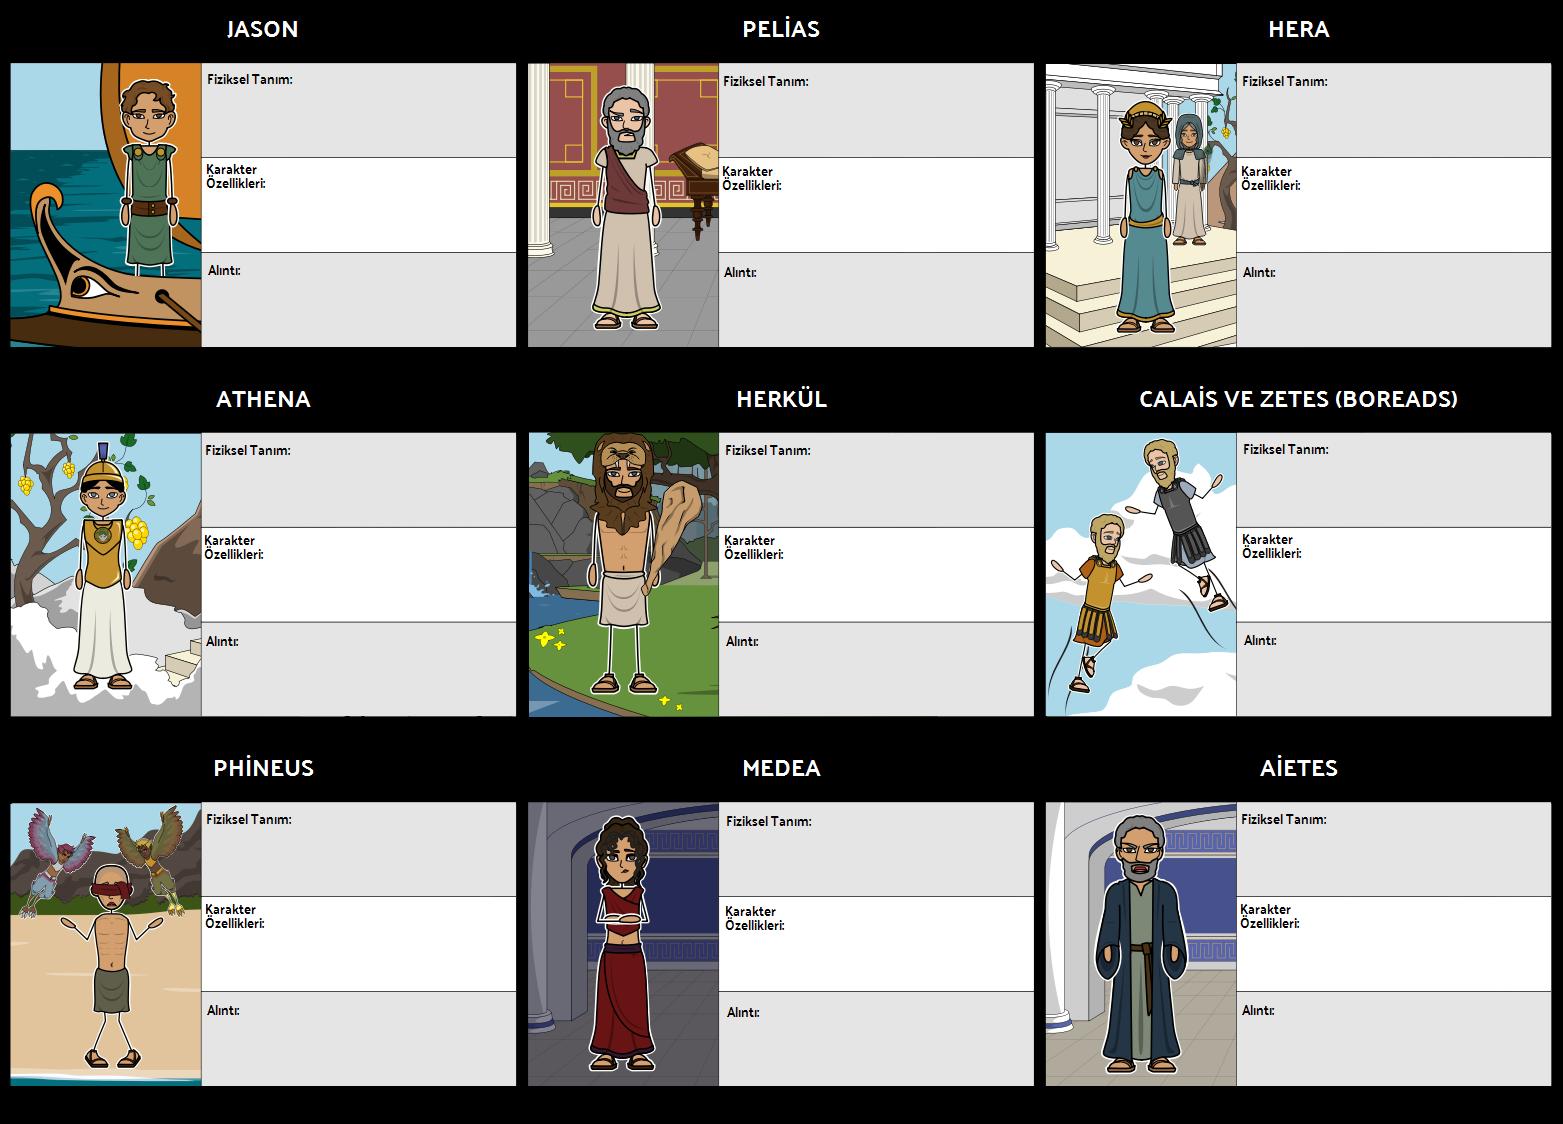 Jason ve Argonauts Karakterleri